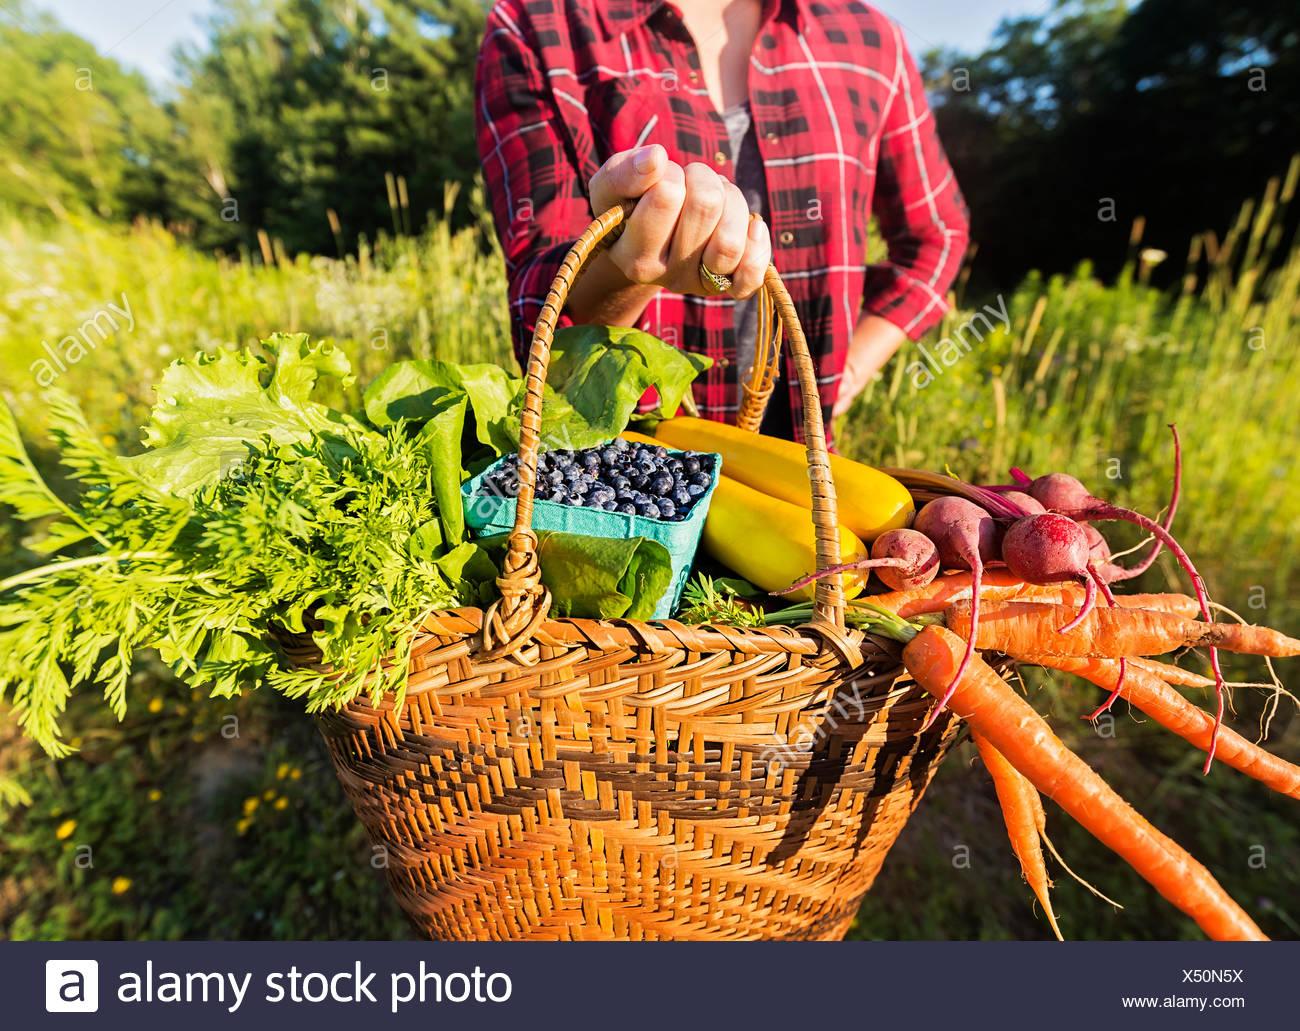 Mid section of woman holding basket avec légumes et fruits Photo Stock